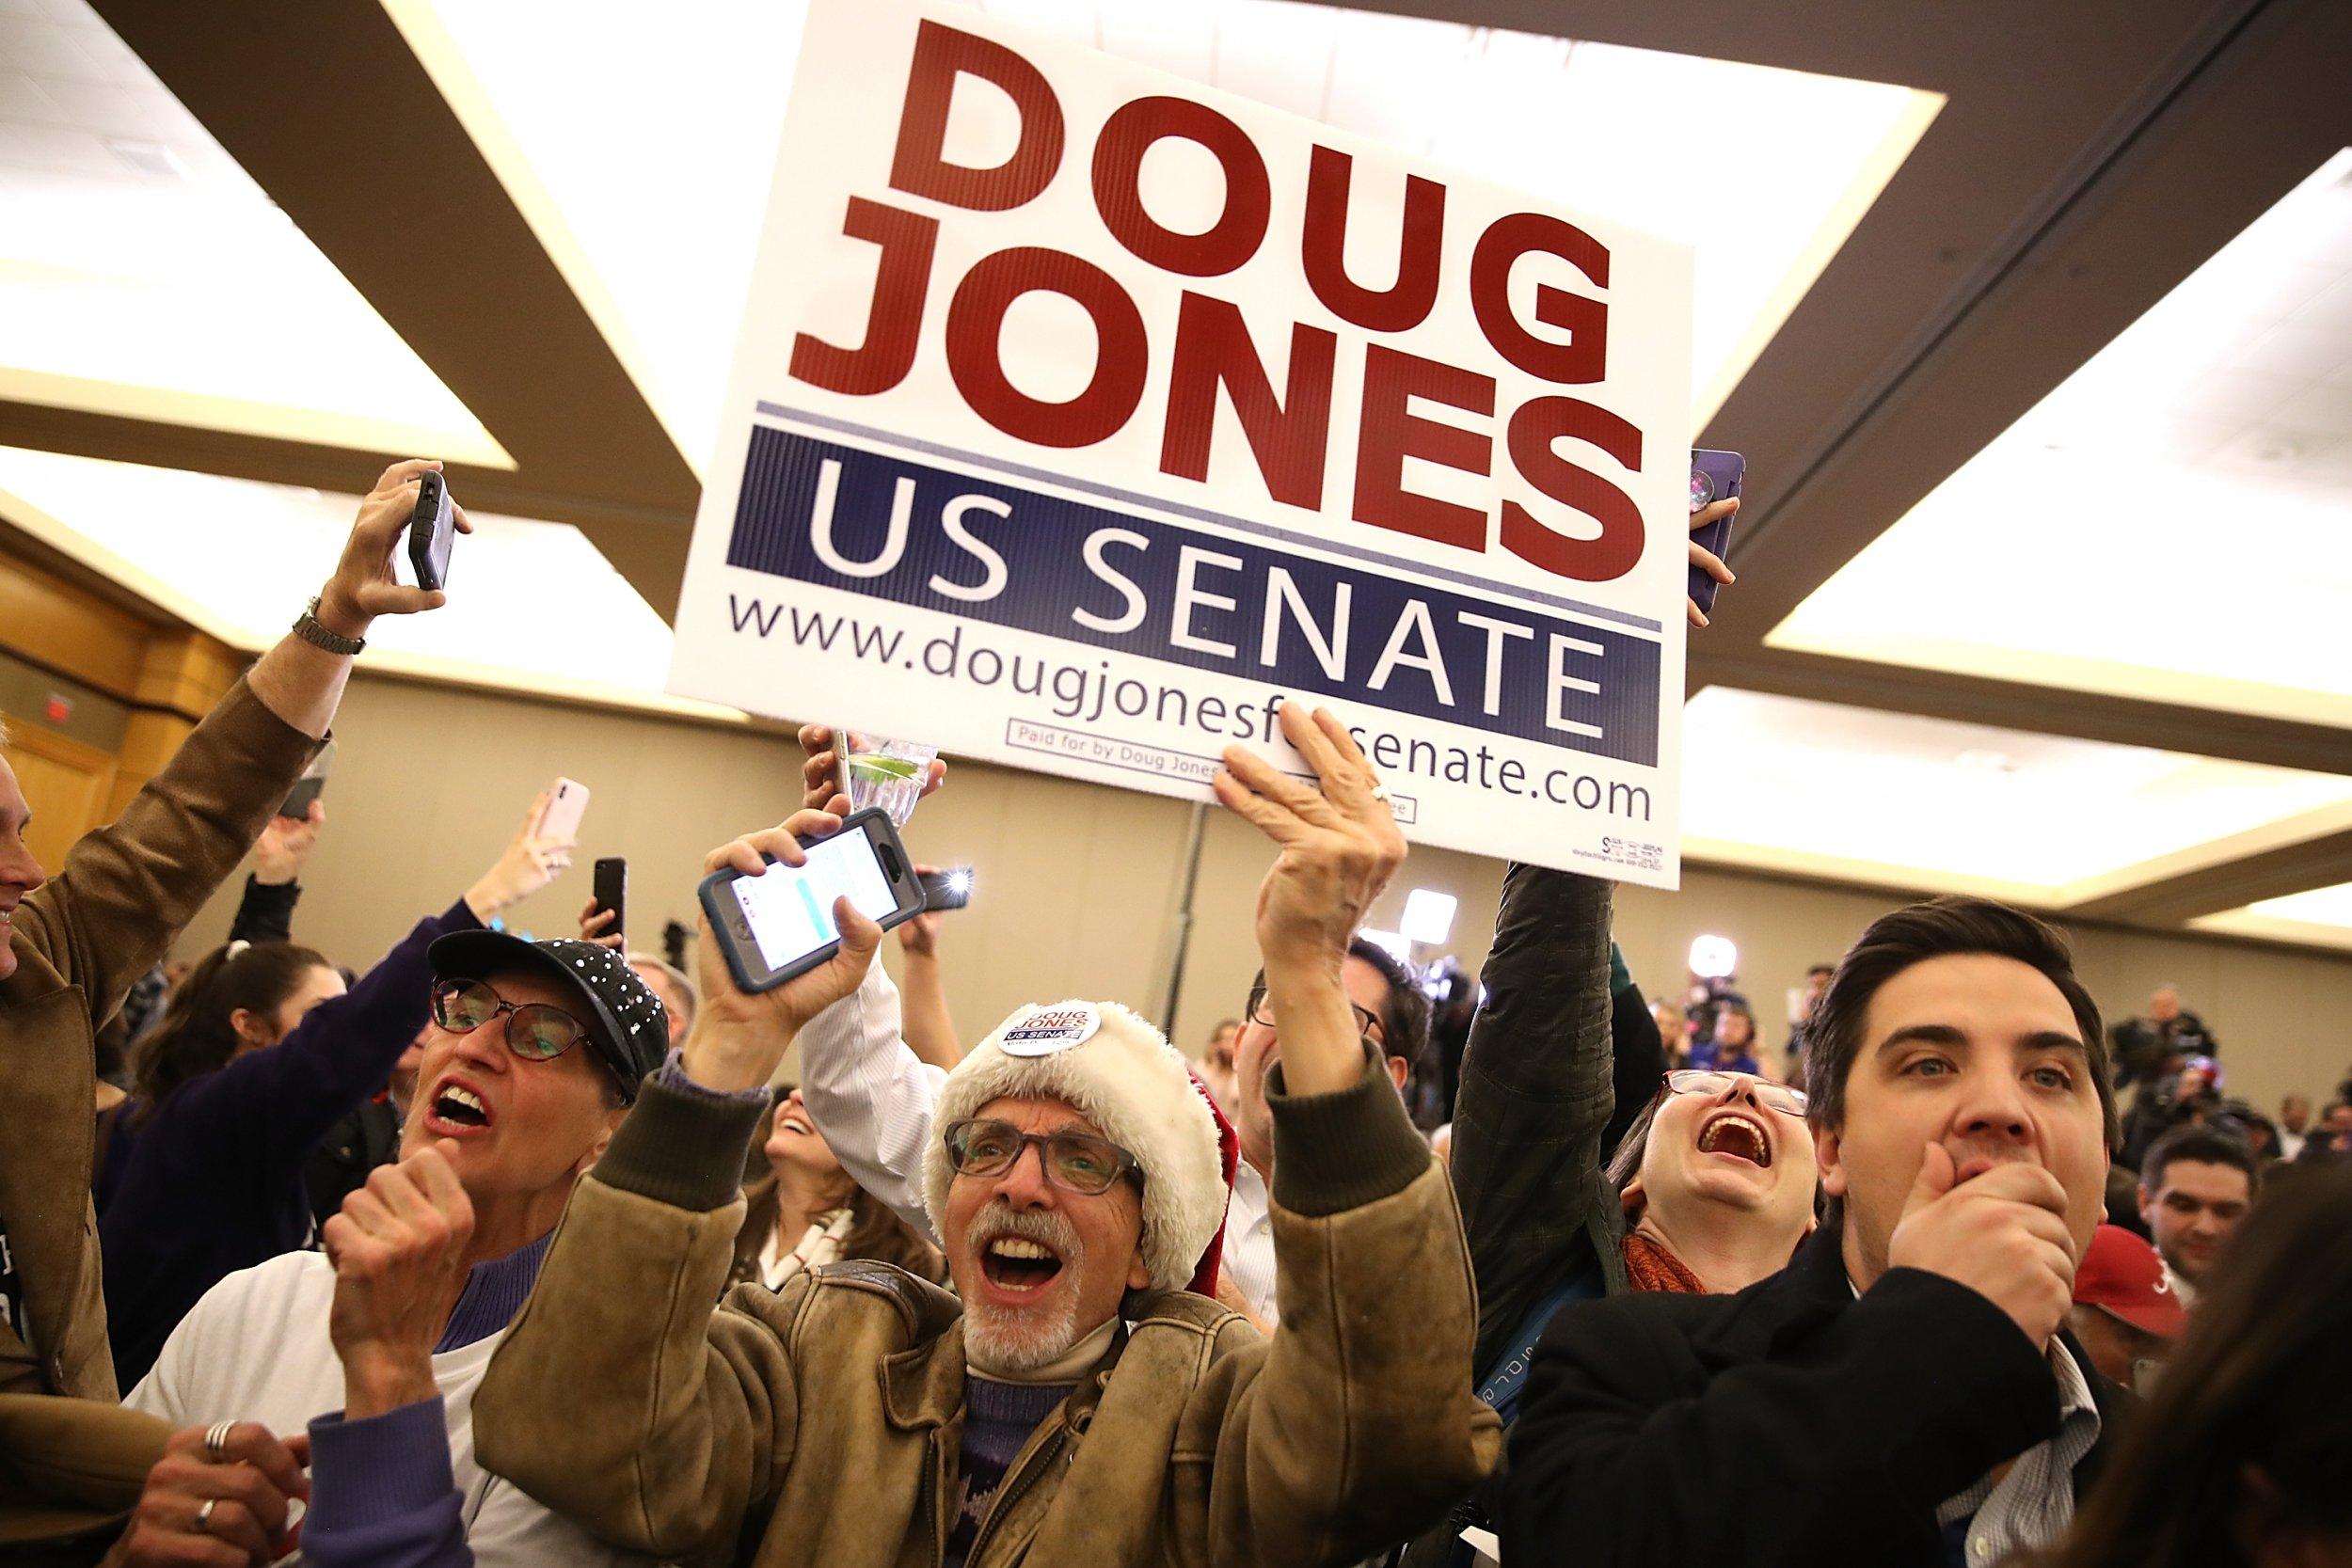 12_13_Doug Jones supporters